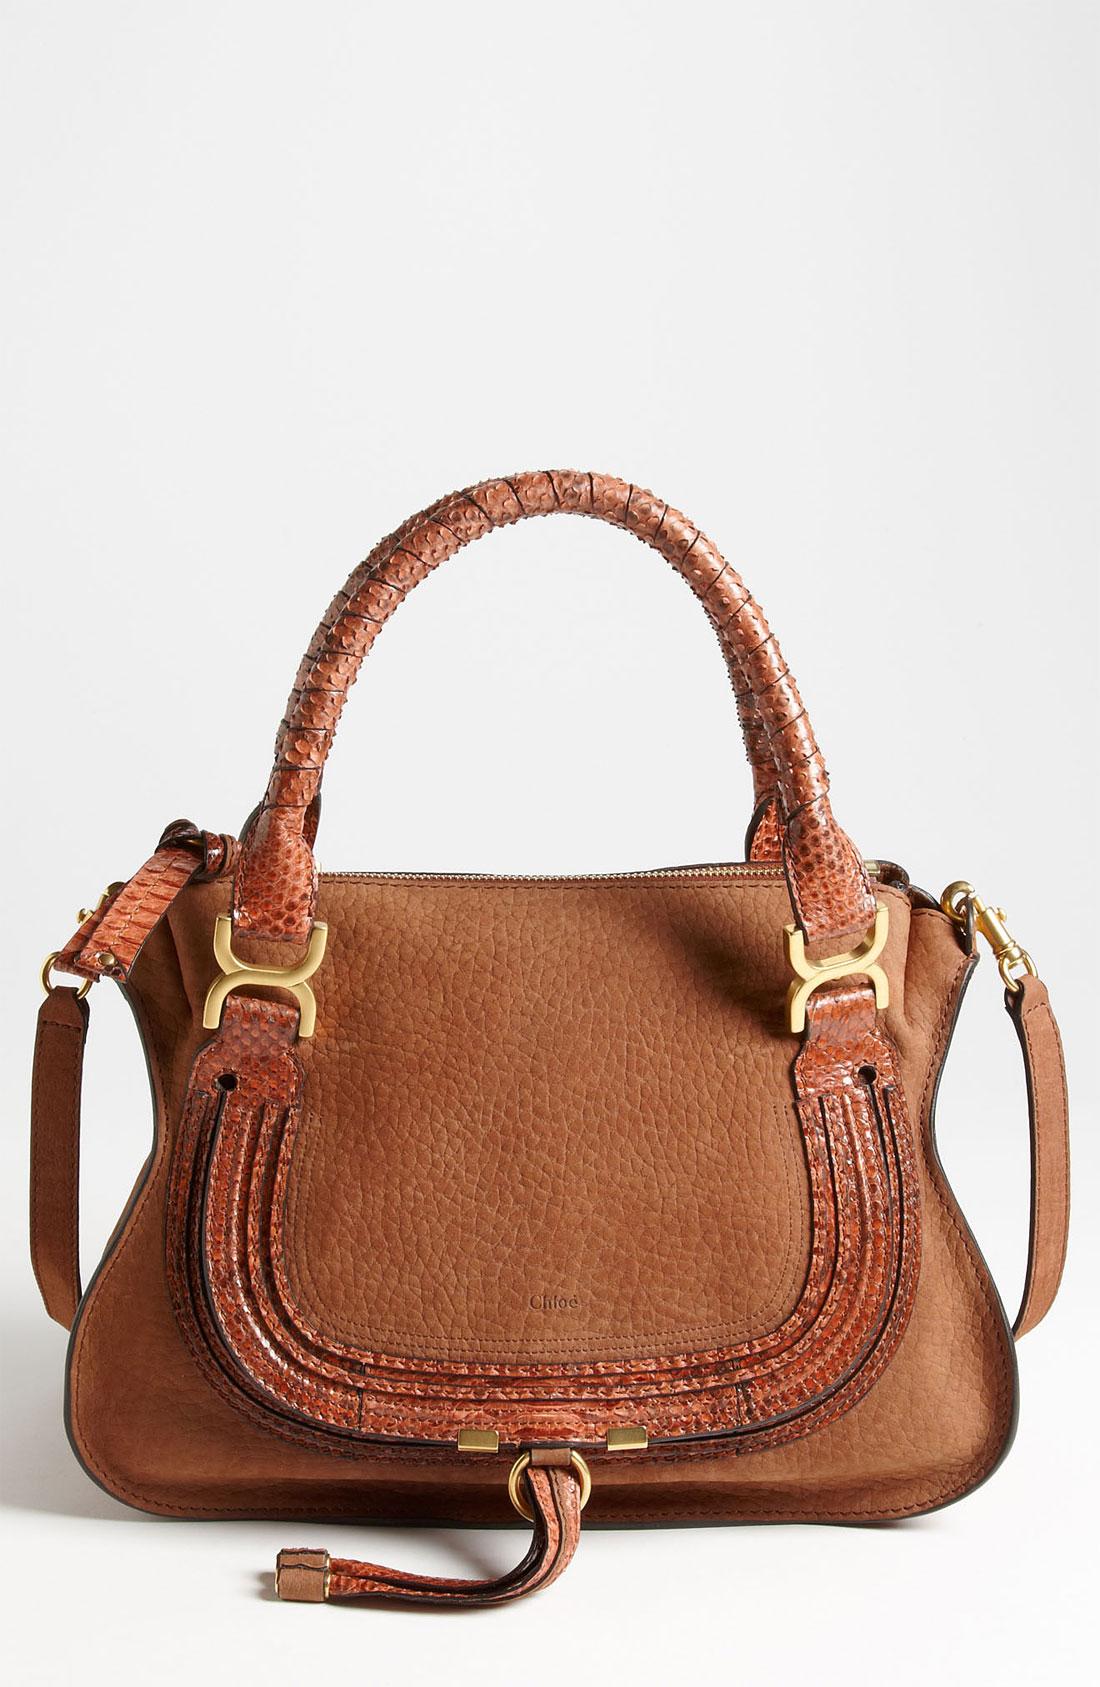 chlo marcie small nubuck leather genuine python satchel. Black Bedroom Furniture Sets. Home Design Ideas